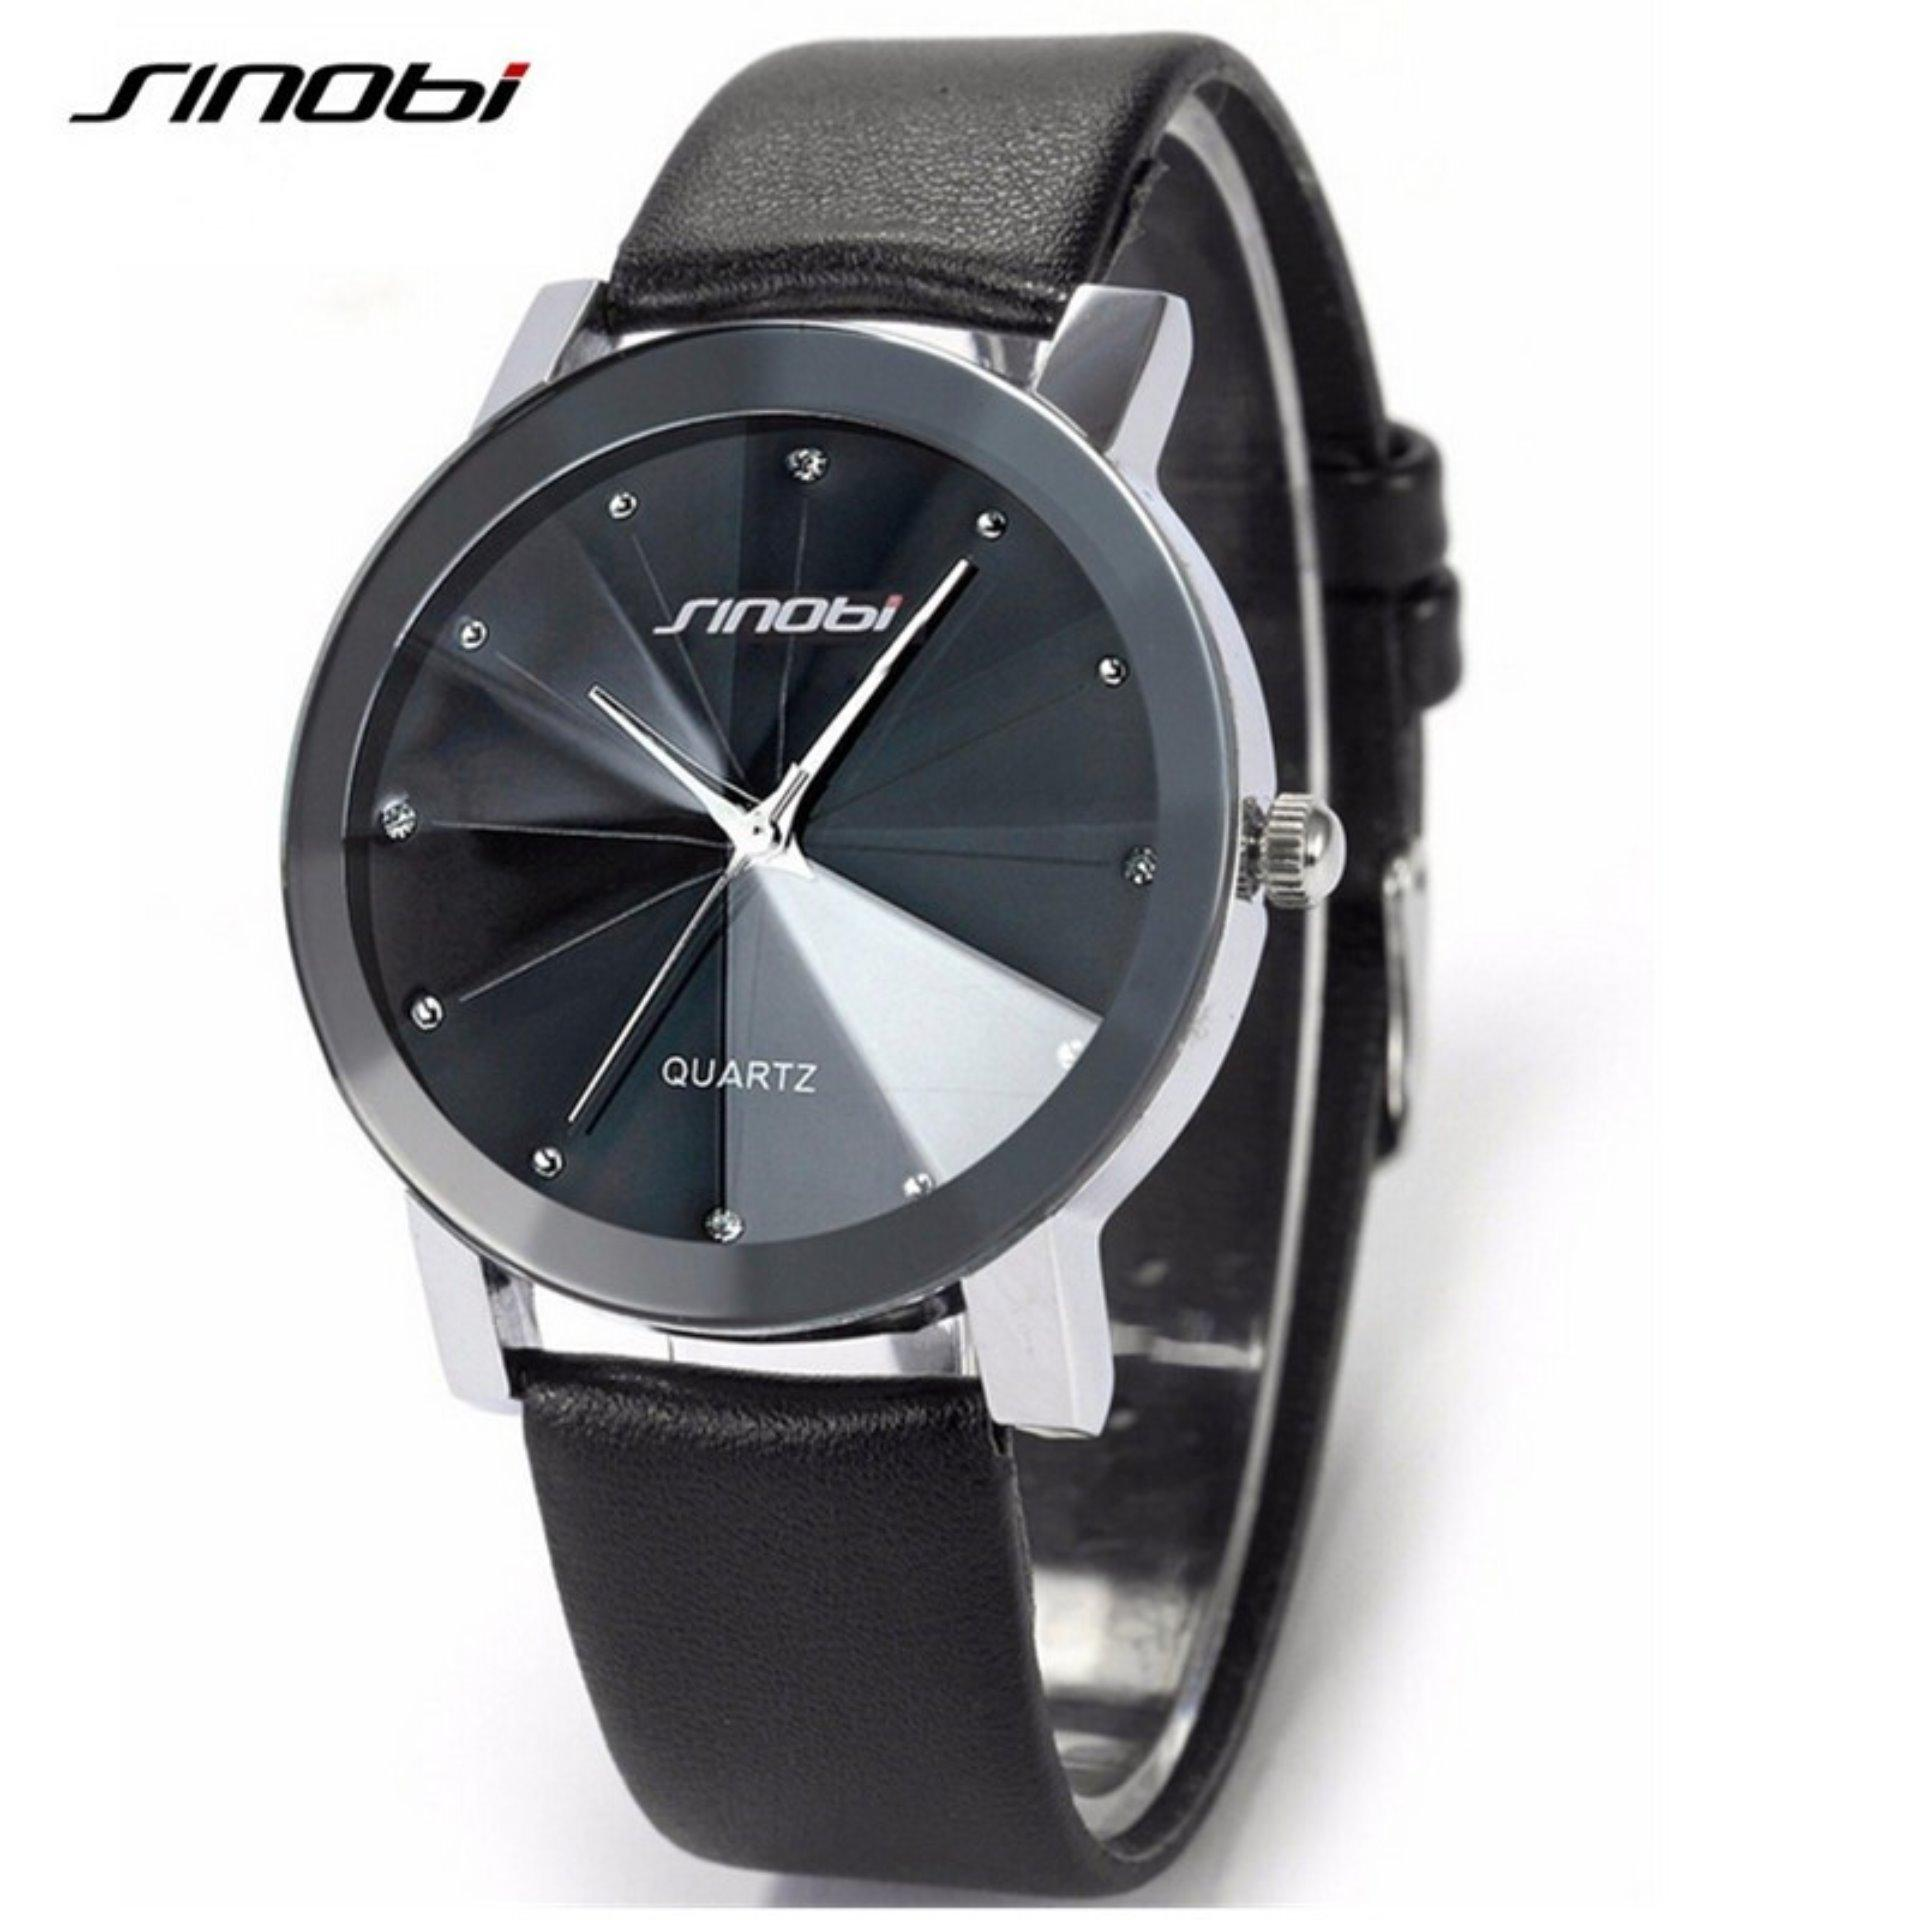 Đồng hồ nam dây da mặt 3D SINOBI MDL-SB907 đen